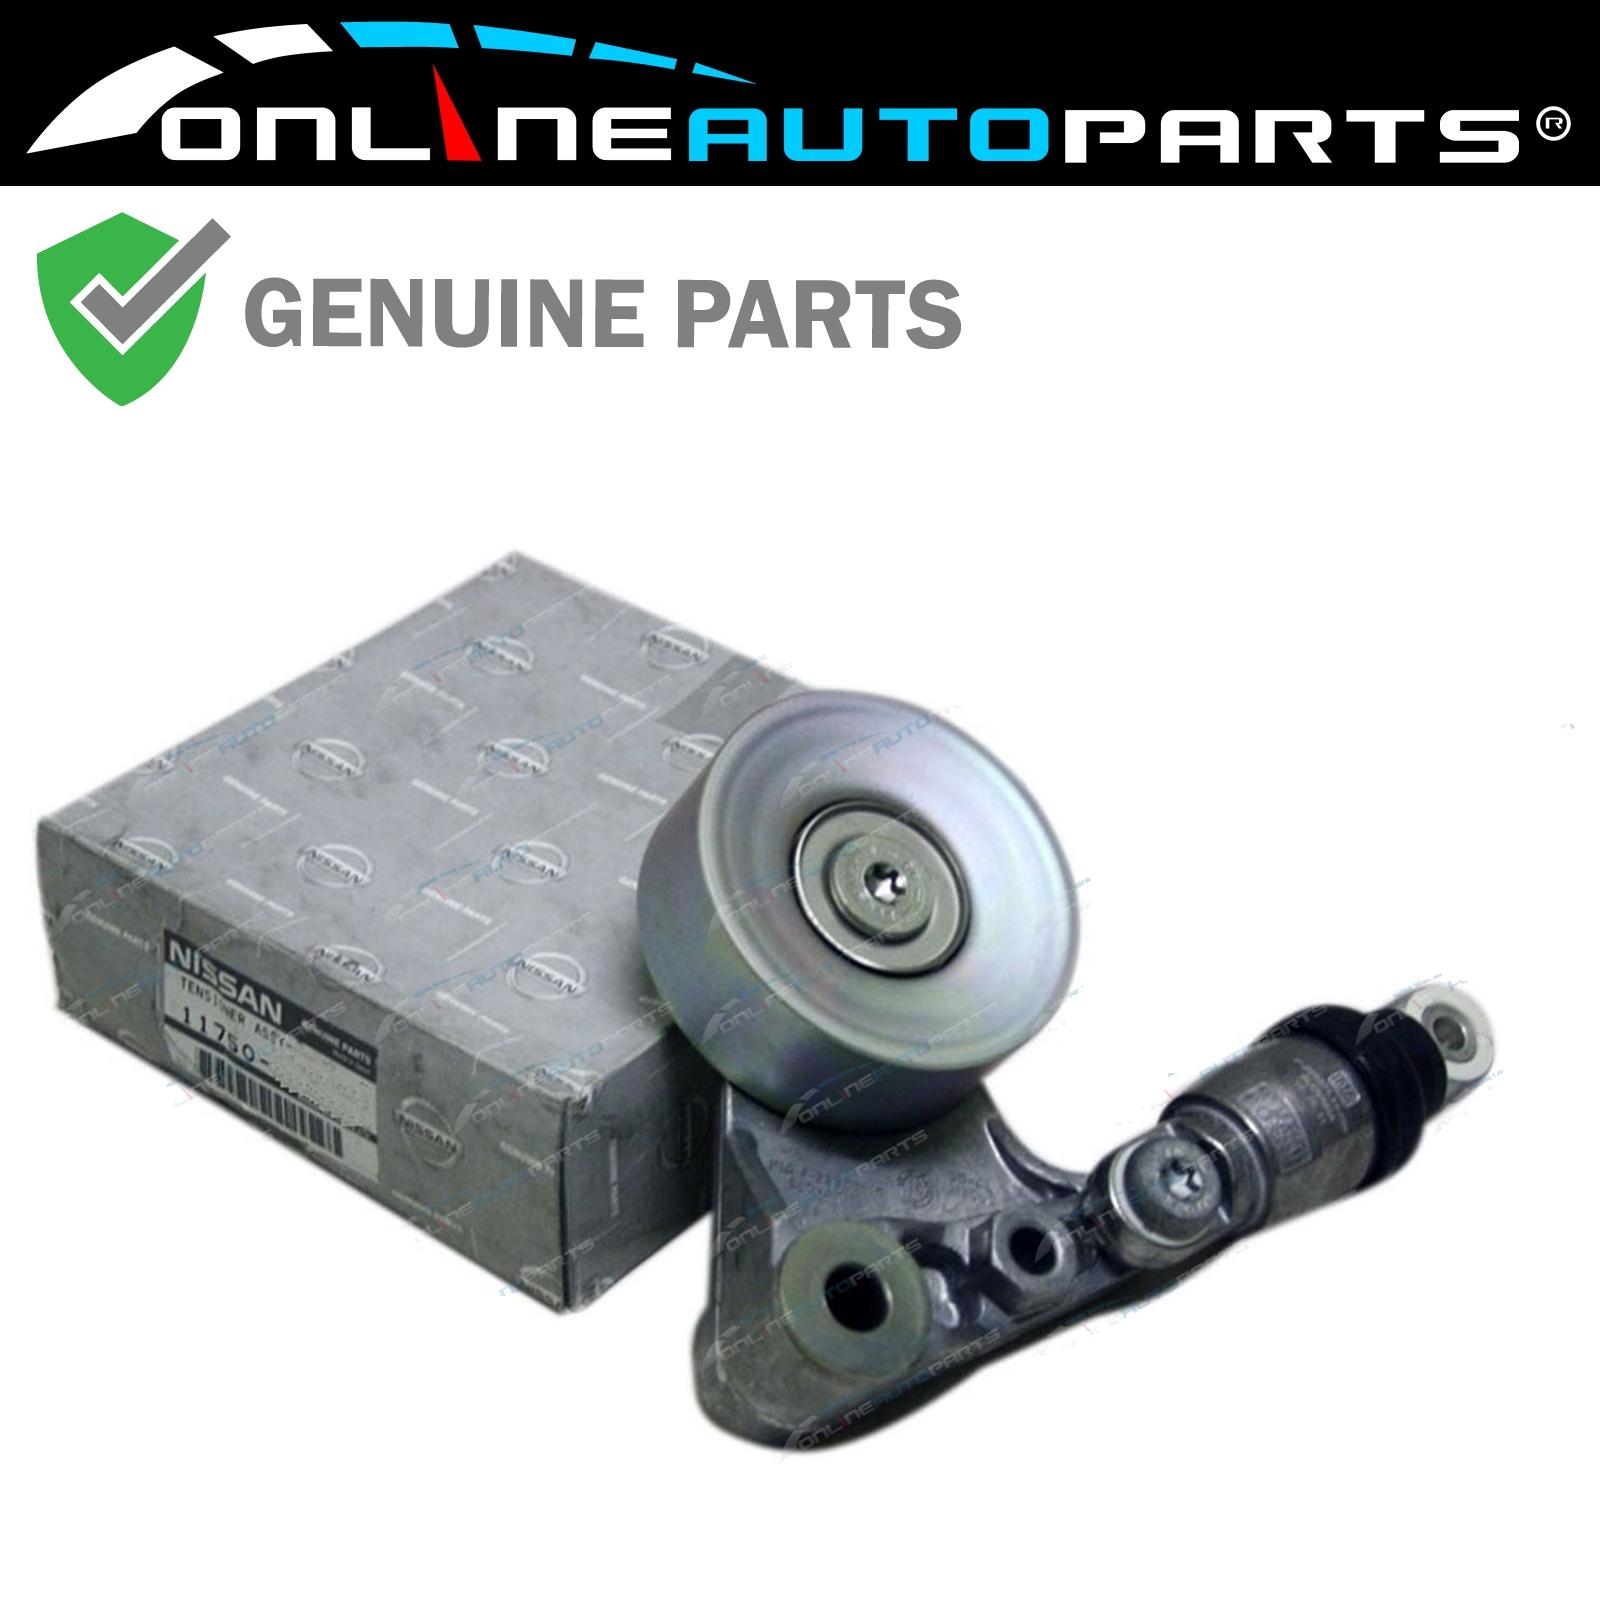 Genuine Engine Drive Belt Tensioner ZD30 Navara D22 Ute 4cyl Diesel 3.0L Fan